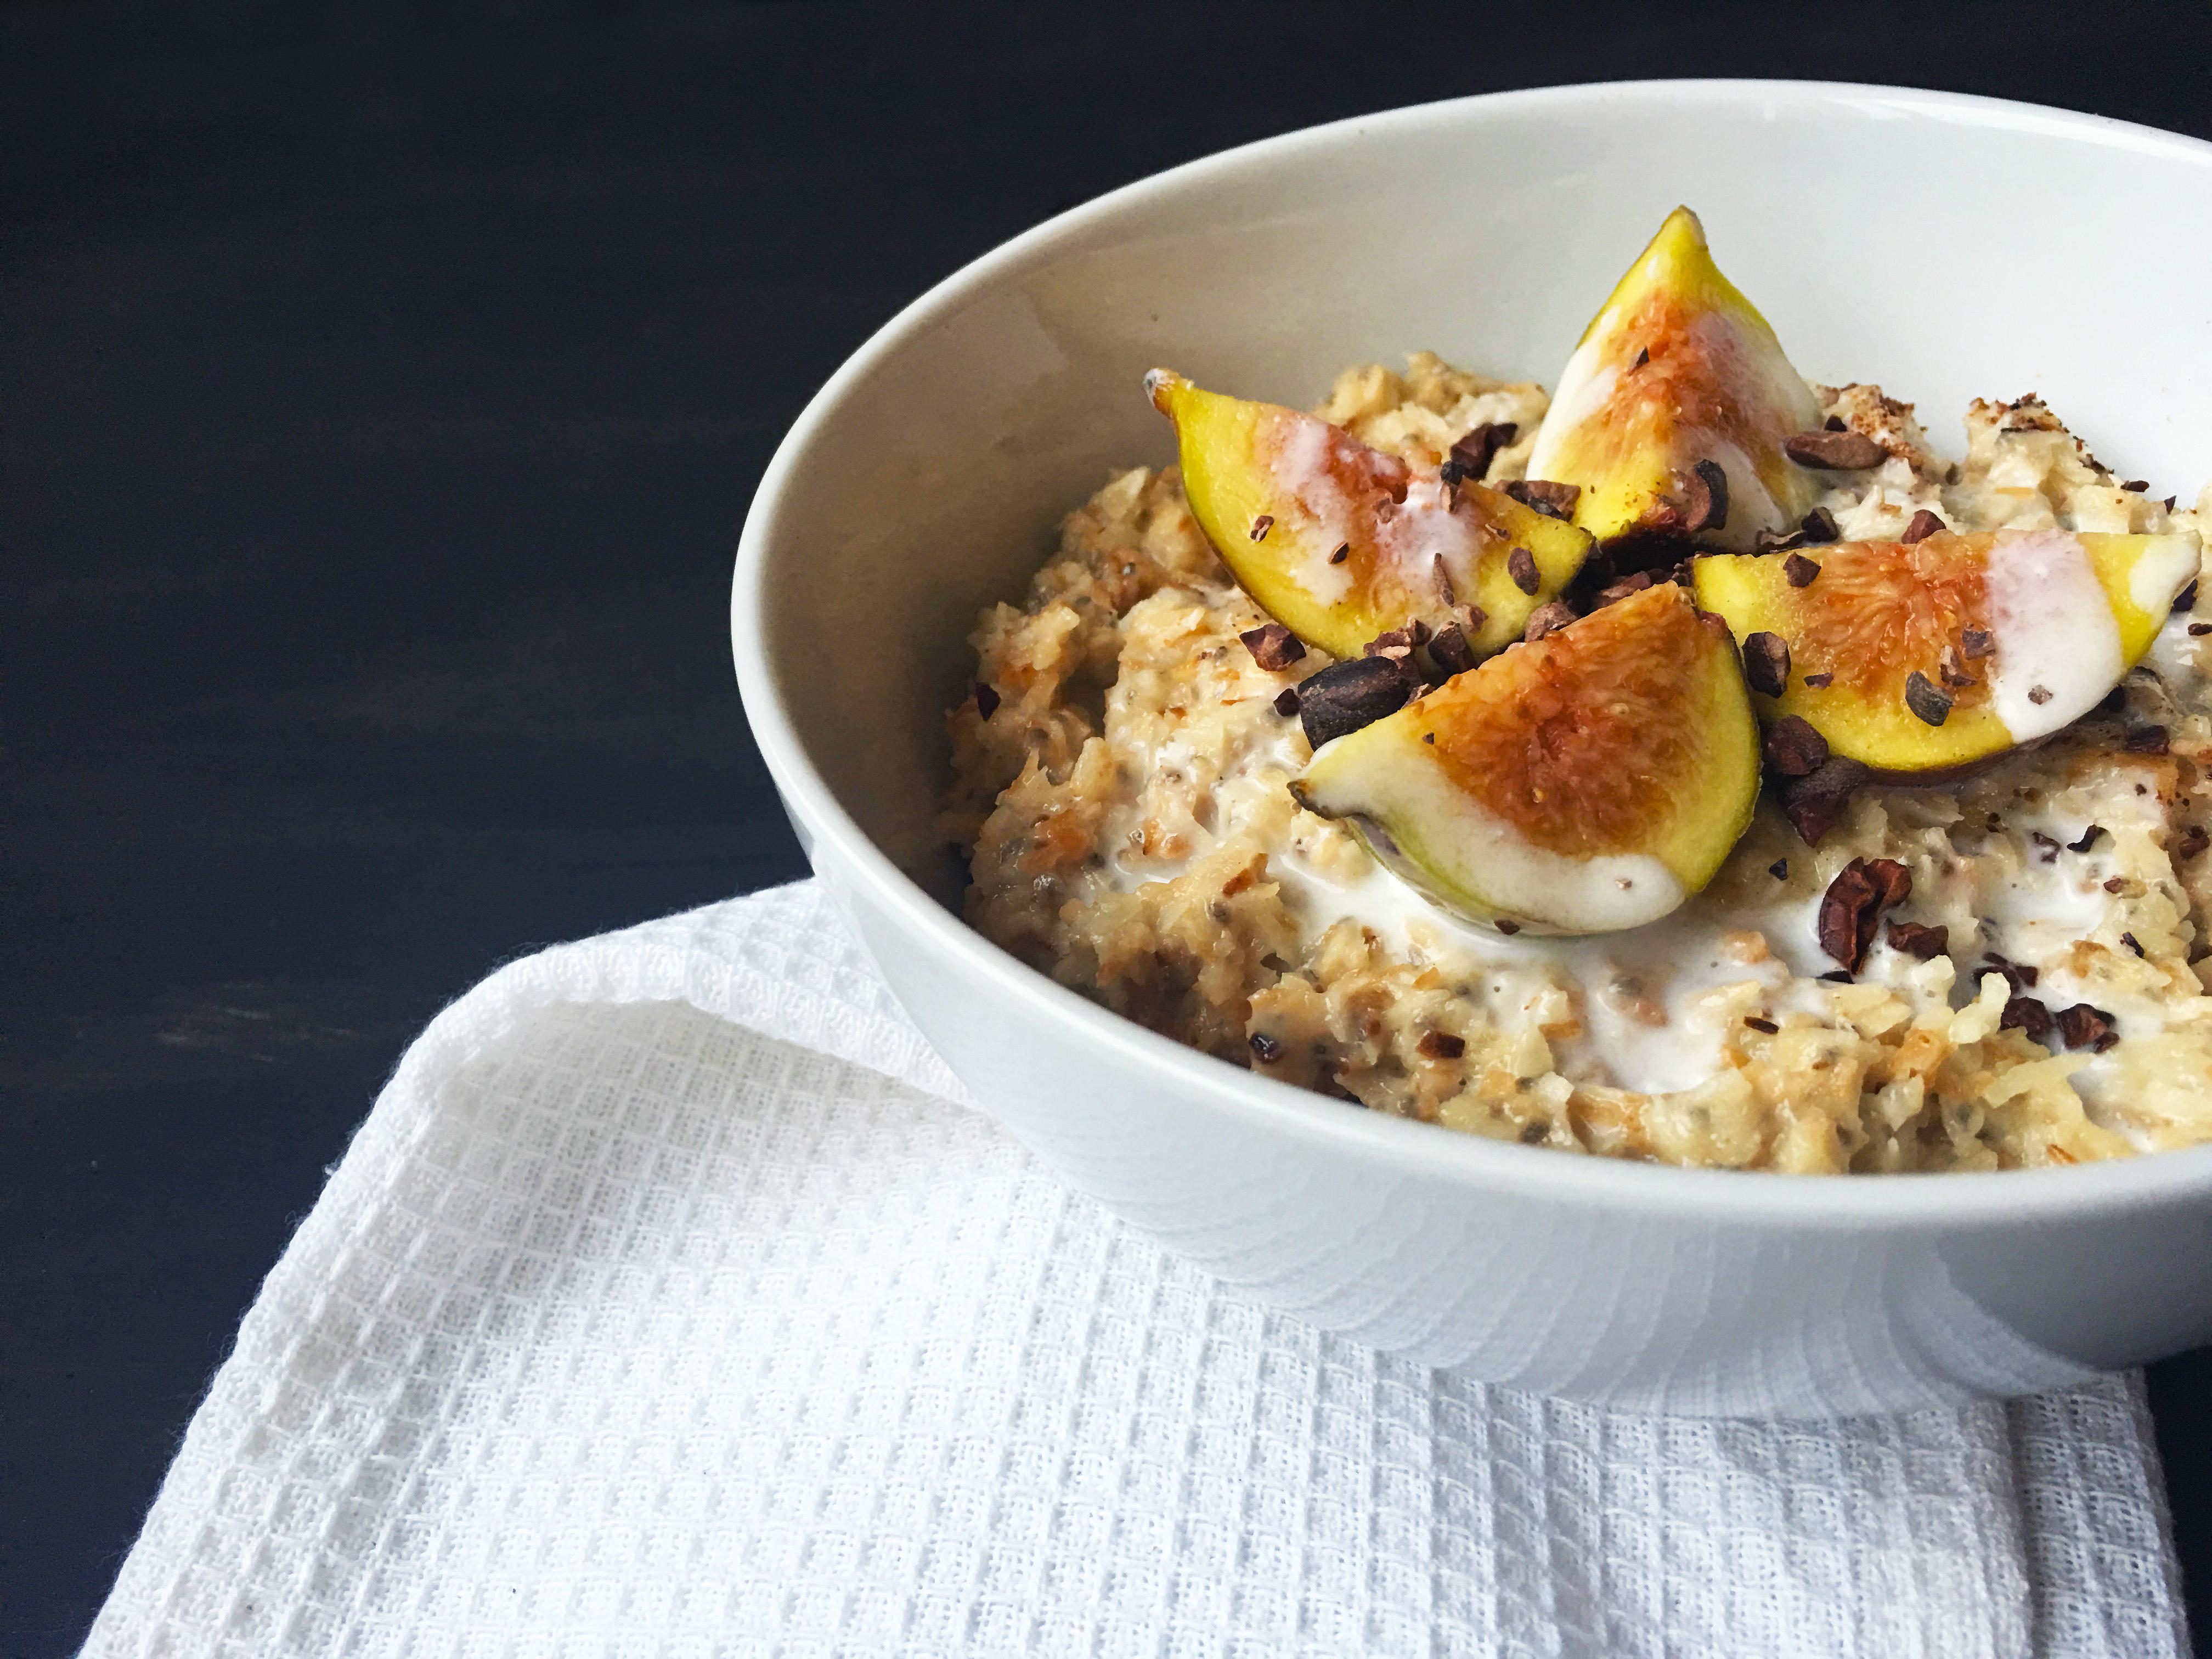 Paleo porridge